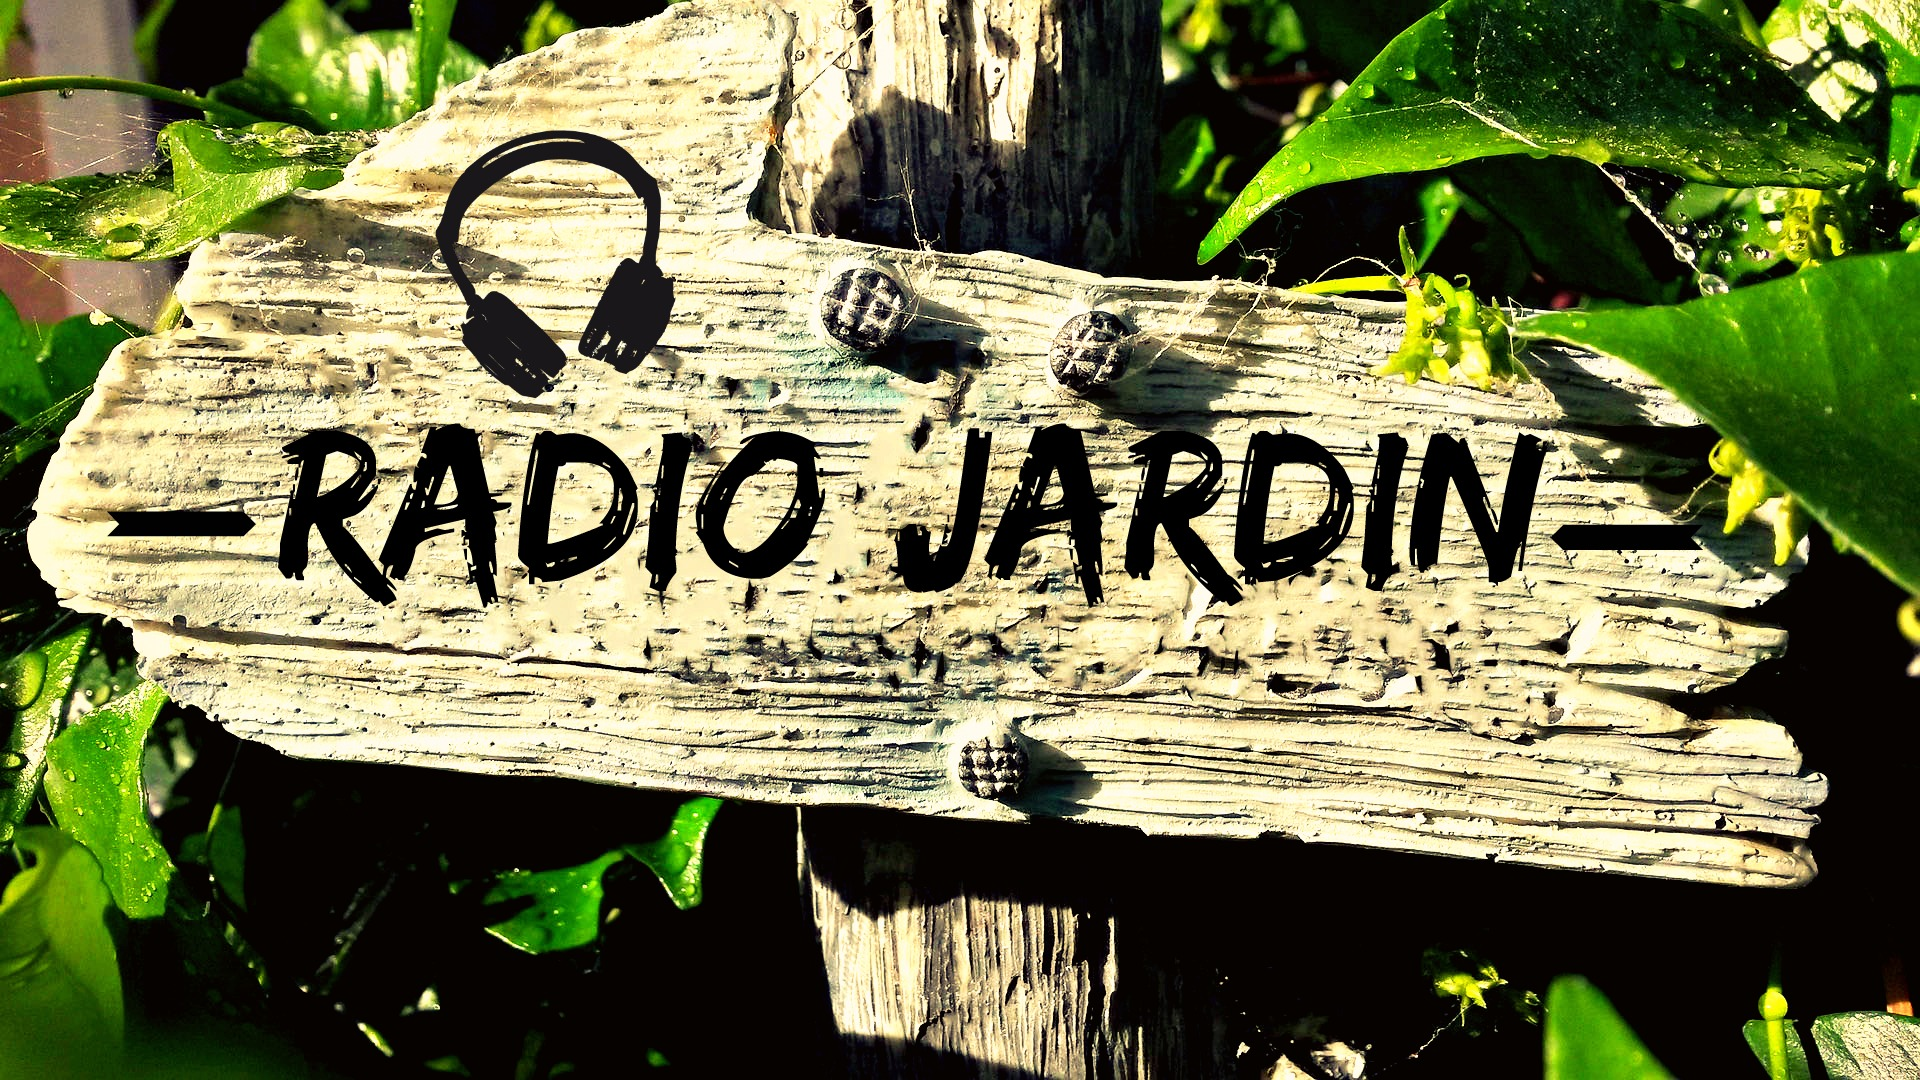 Radio Jardin du 20 septembre 2016